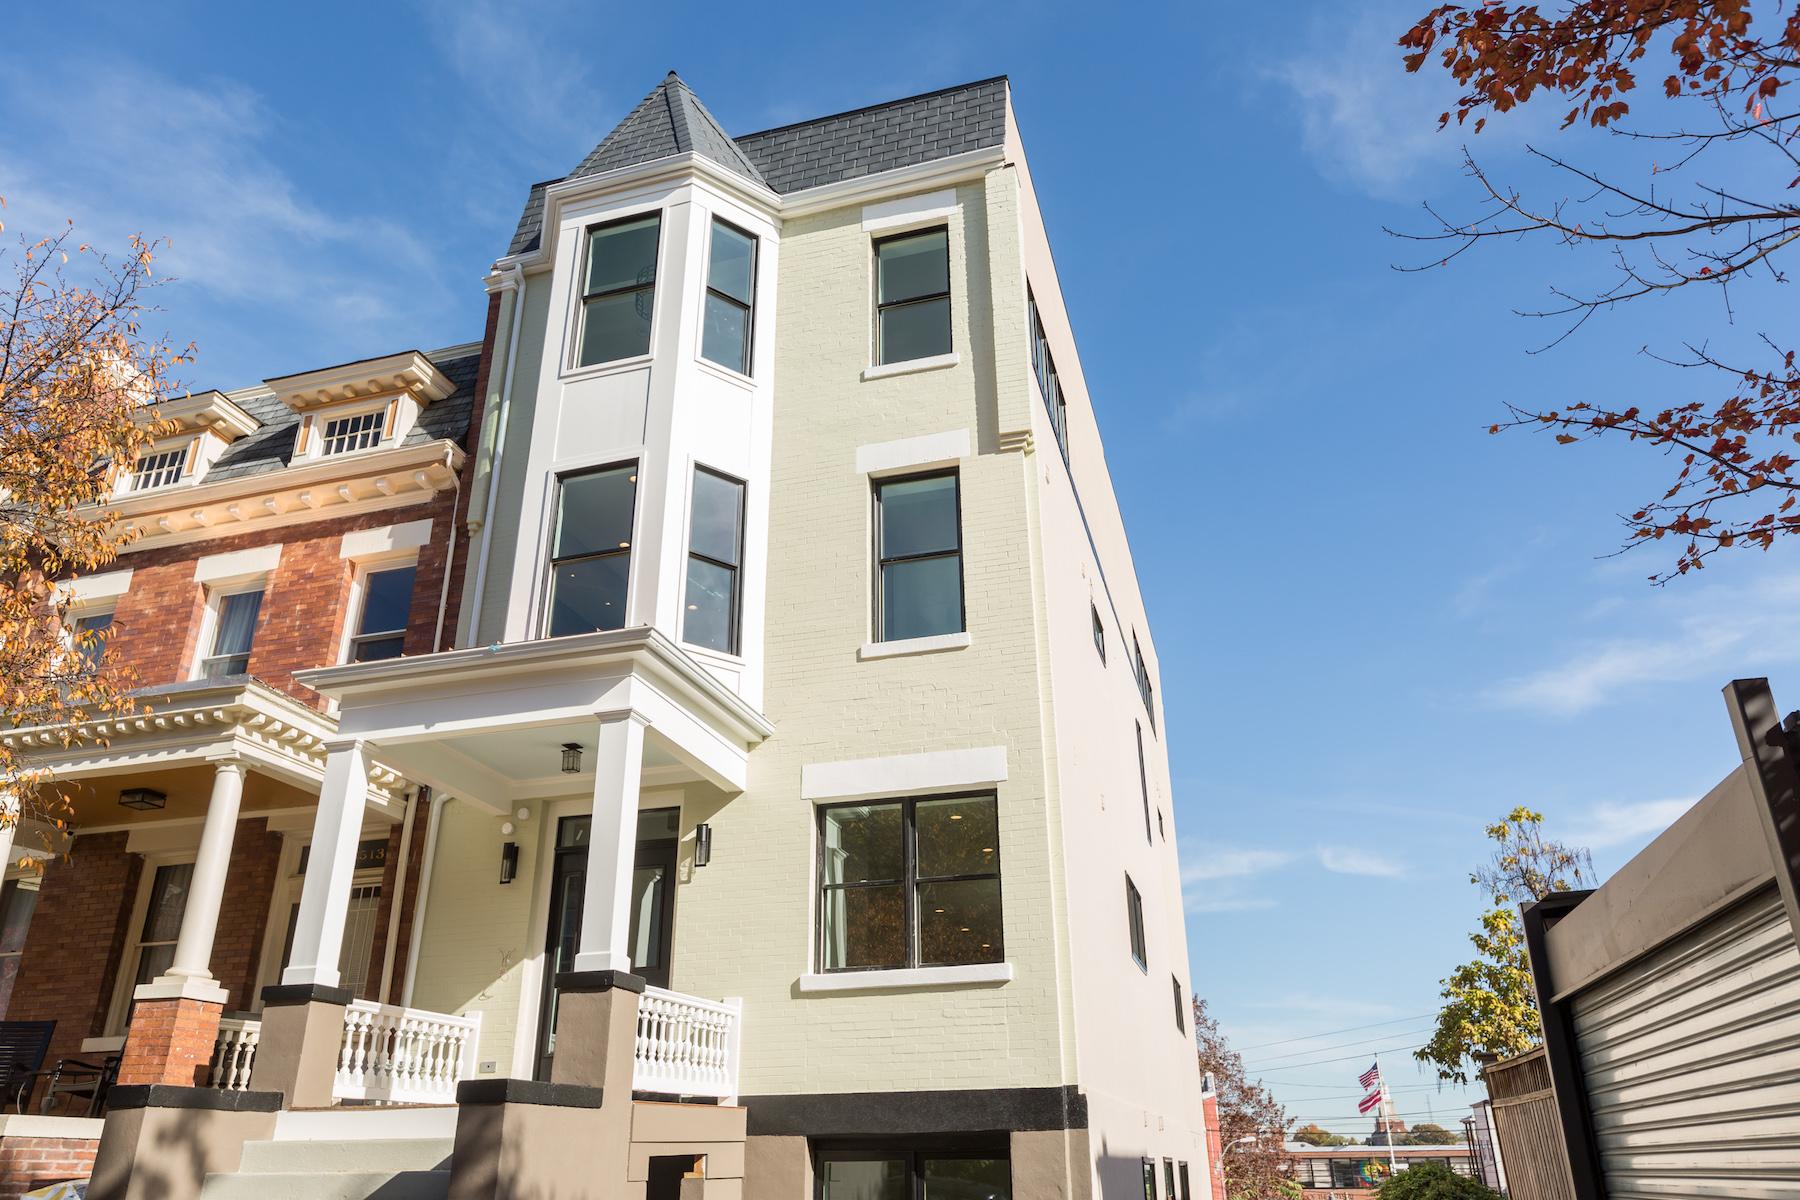 Condominium for Sale at 2511 12th Street Nw 2, Washington Washington, District Of Columbia, 20009 United States